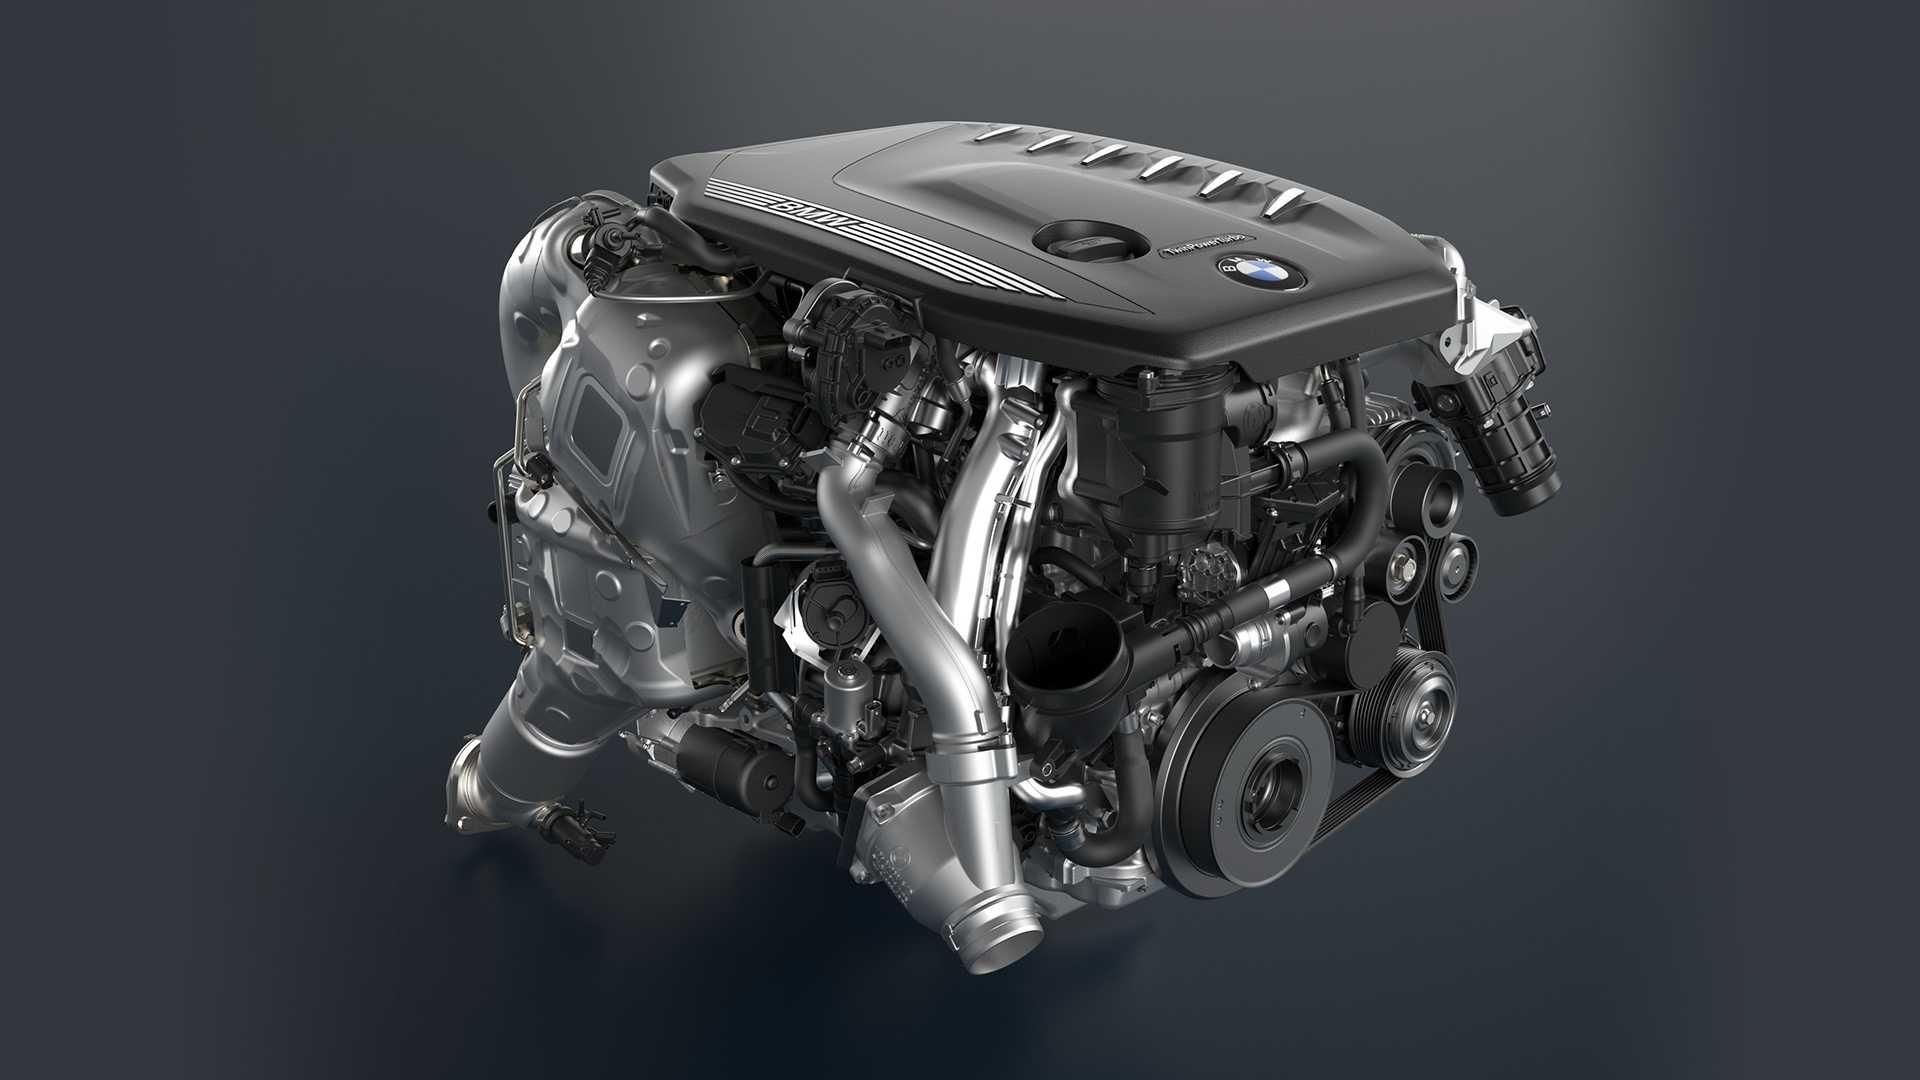 BMW-6-Series-GT-Gran-Turismo-facelift-2021-52